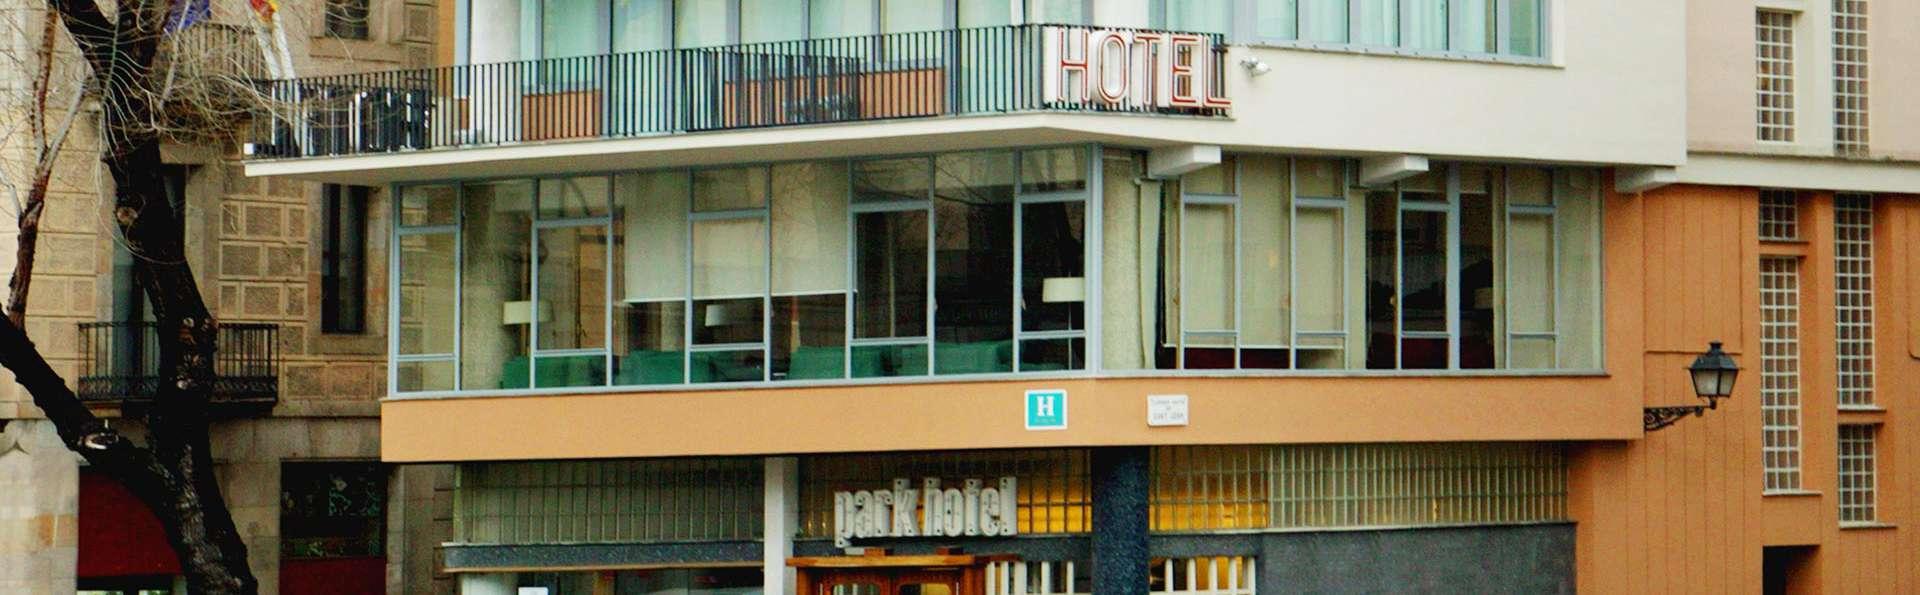 Park Hotel Barcelona - EDIT_FRONT_01.jpg